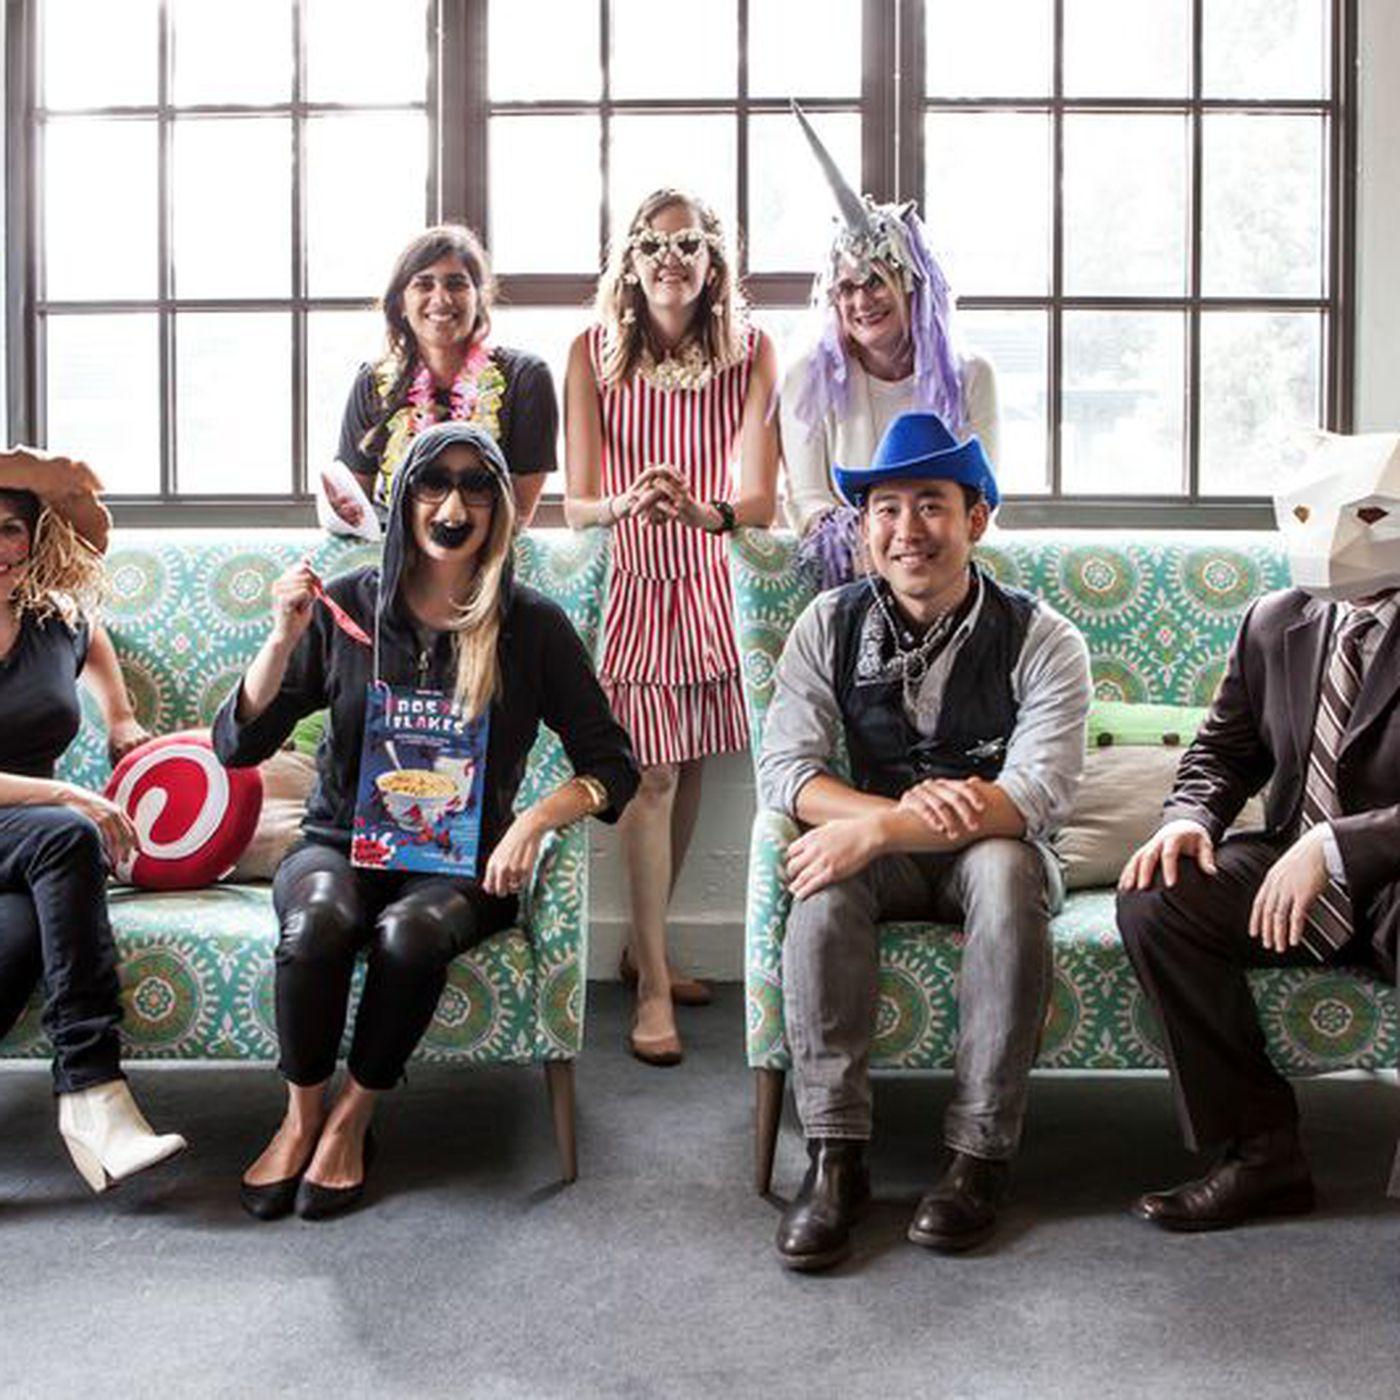 Halloween Costume Pinterest.See Pinterest Staffers Model Their Crafty Halloween Costumes Racked